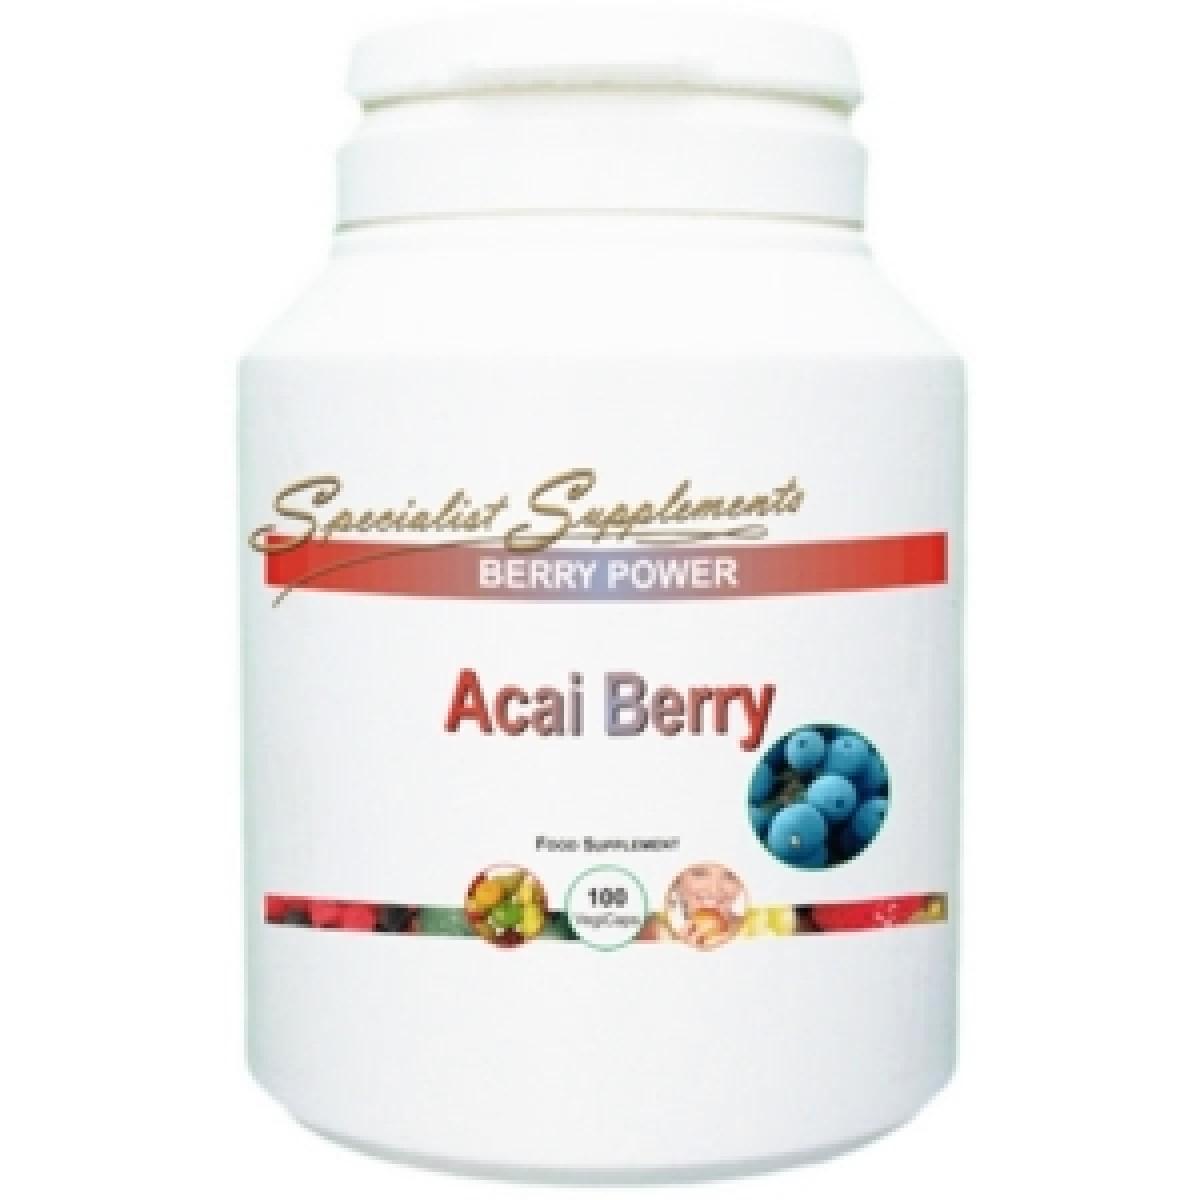 colon cleanse acai berry weight loss lose detox diet